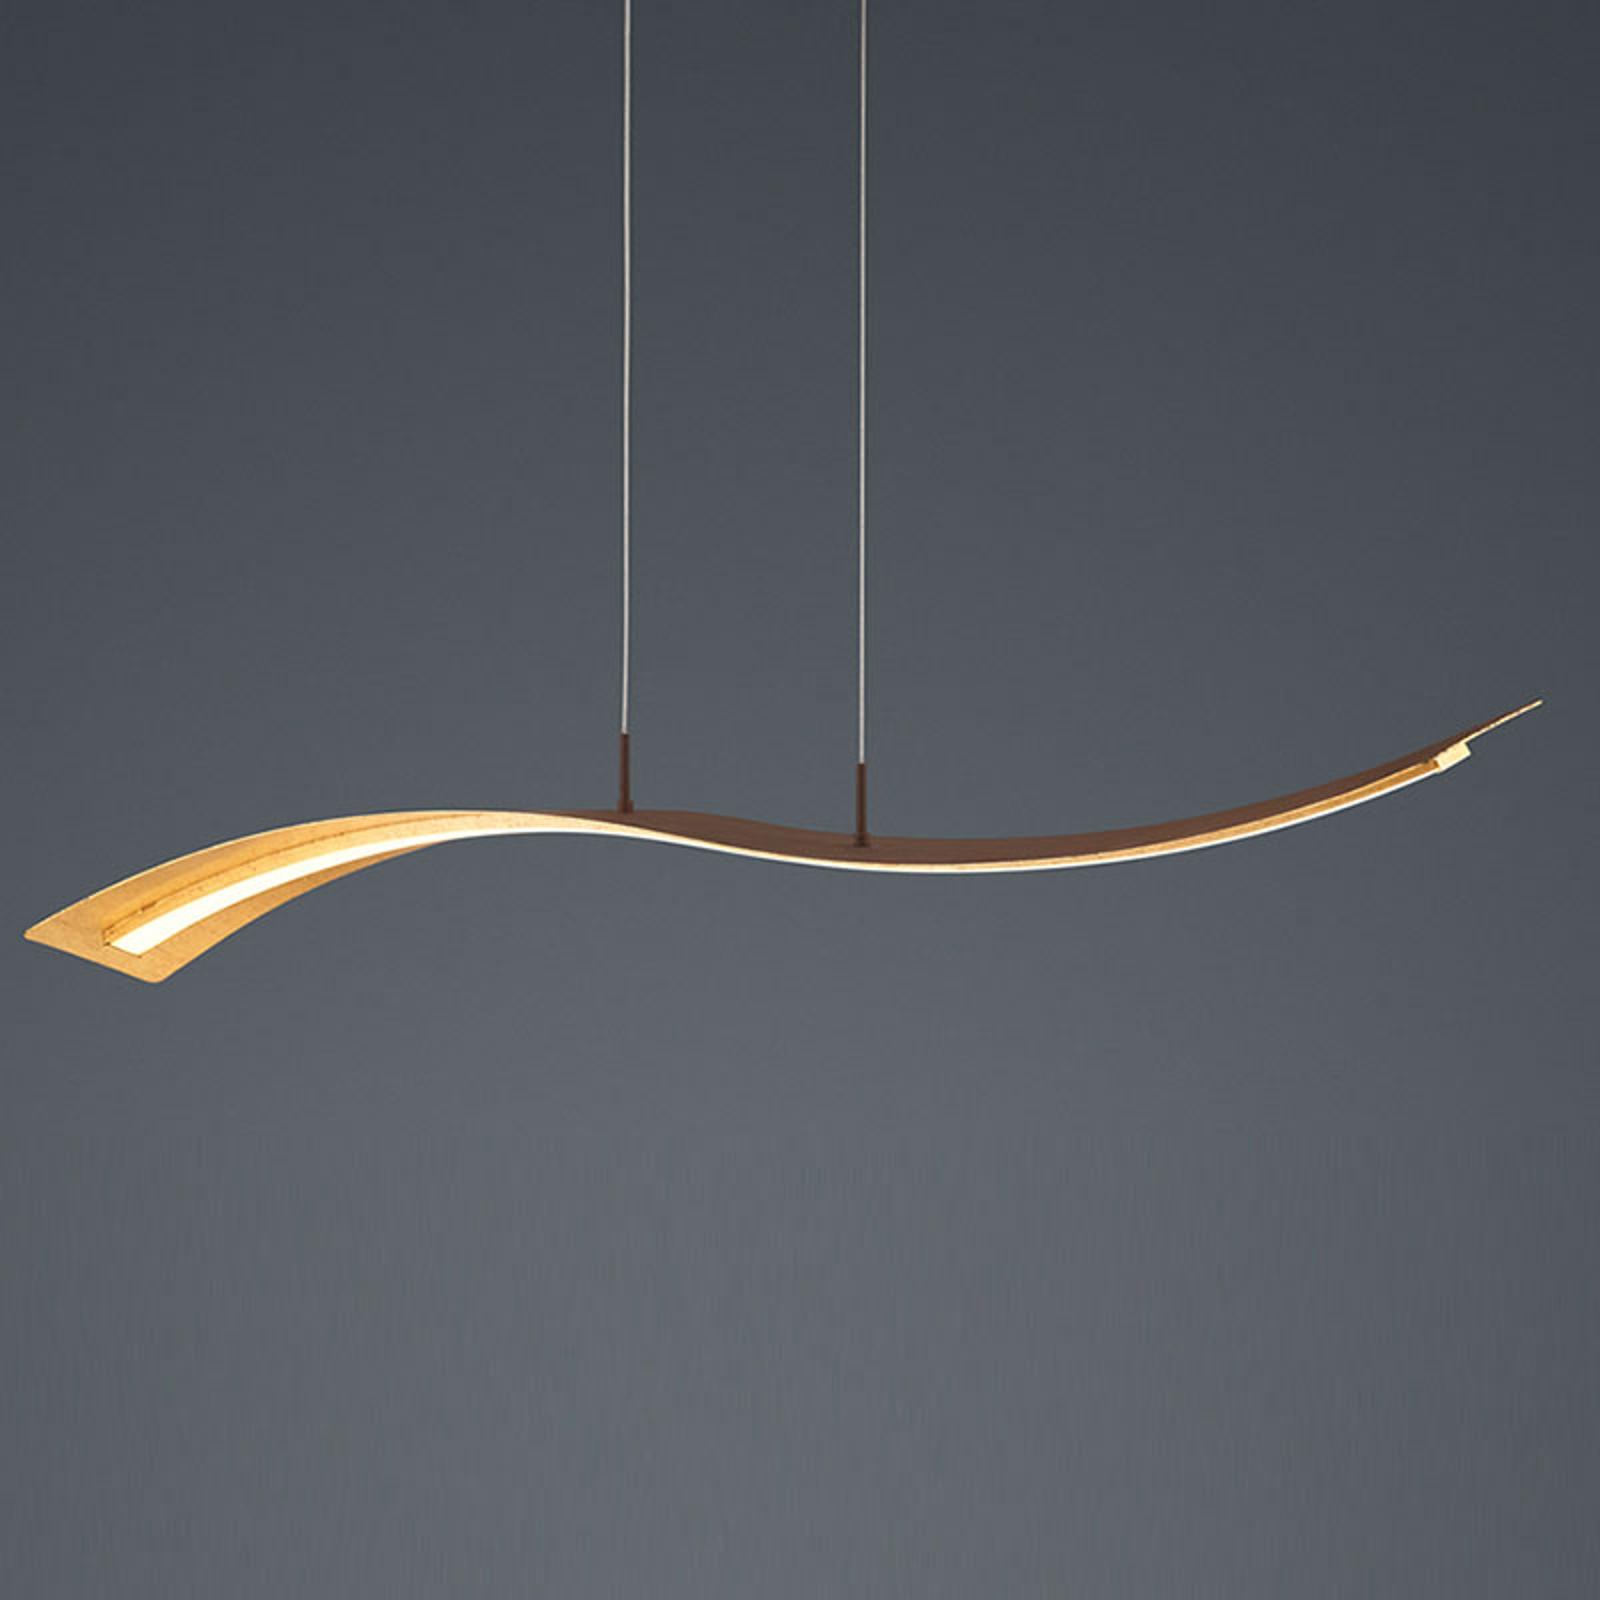 LED hanglamp Salerno, SwitchDim, goud